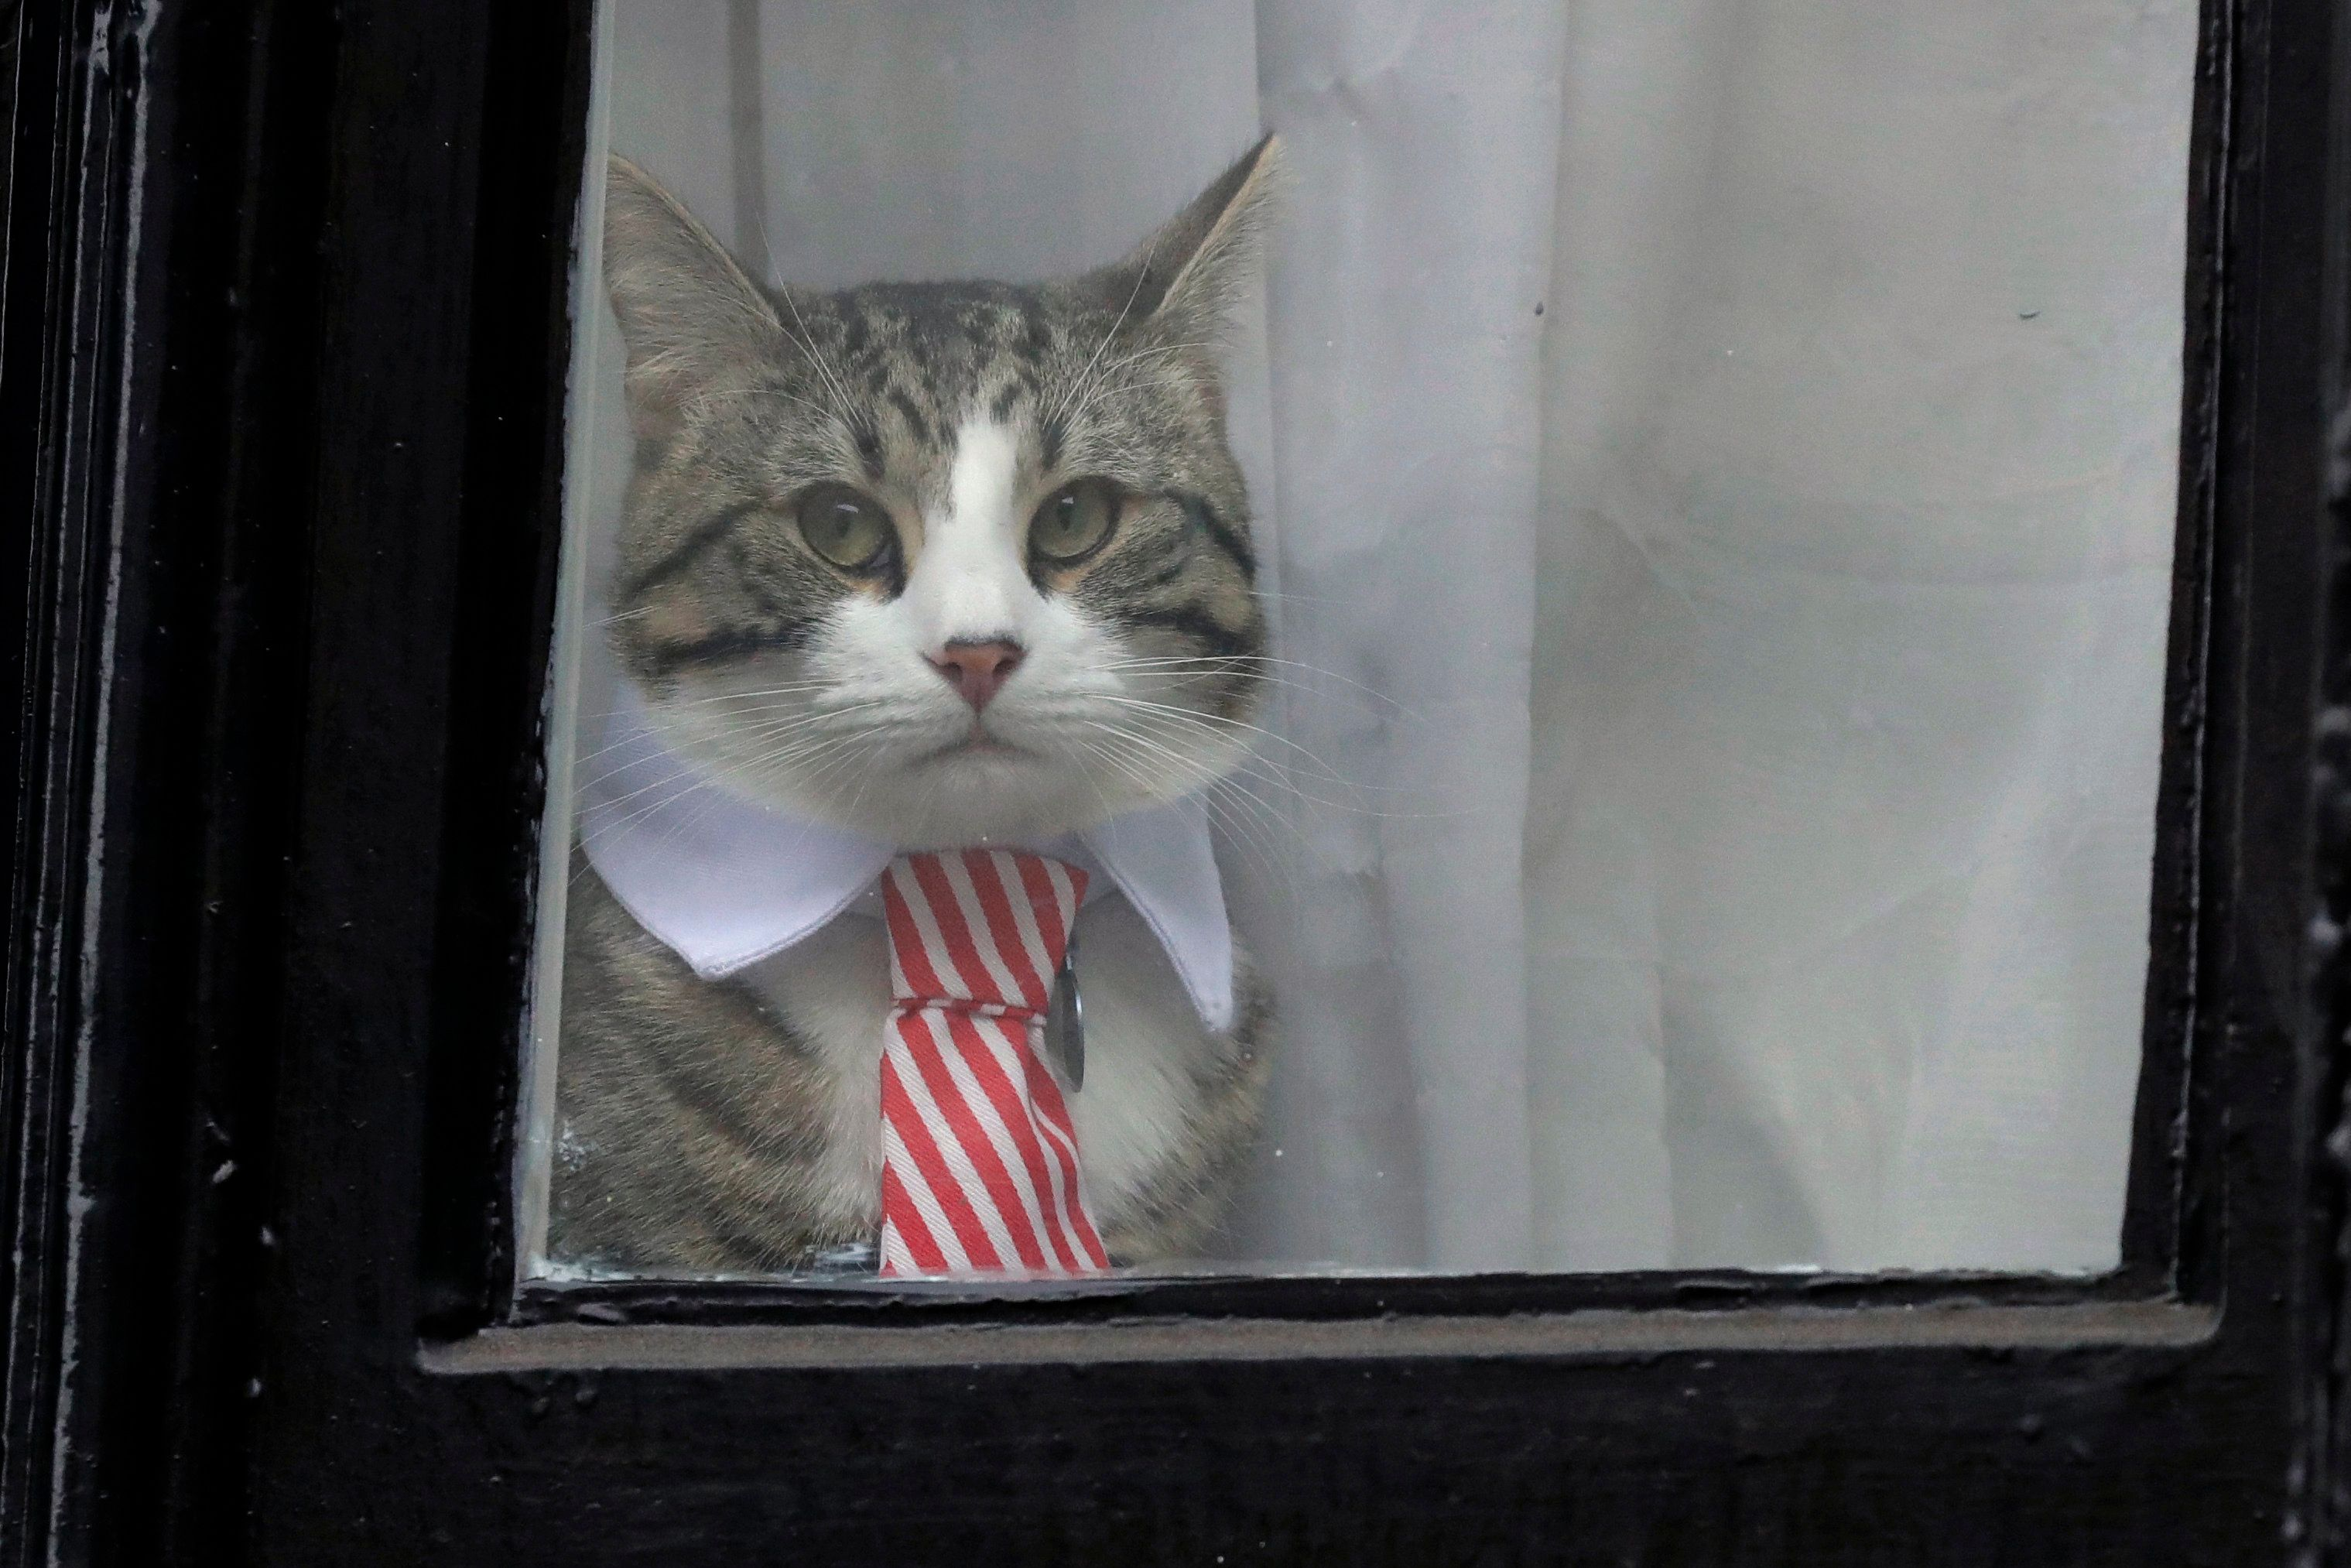 Julian Assange's cat, seen ata window of the Ecuadorian Embassy in London in 2016.